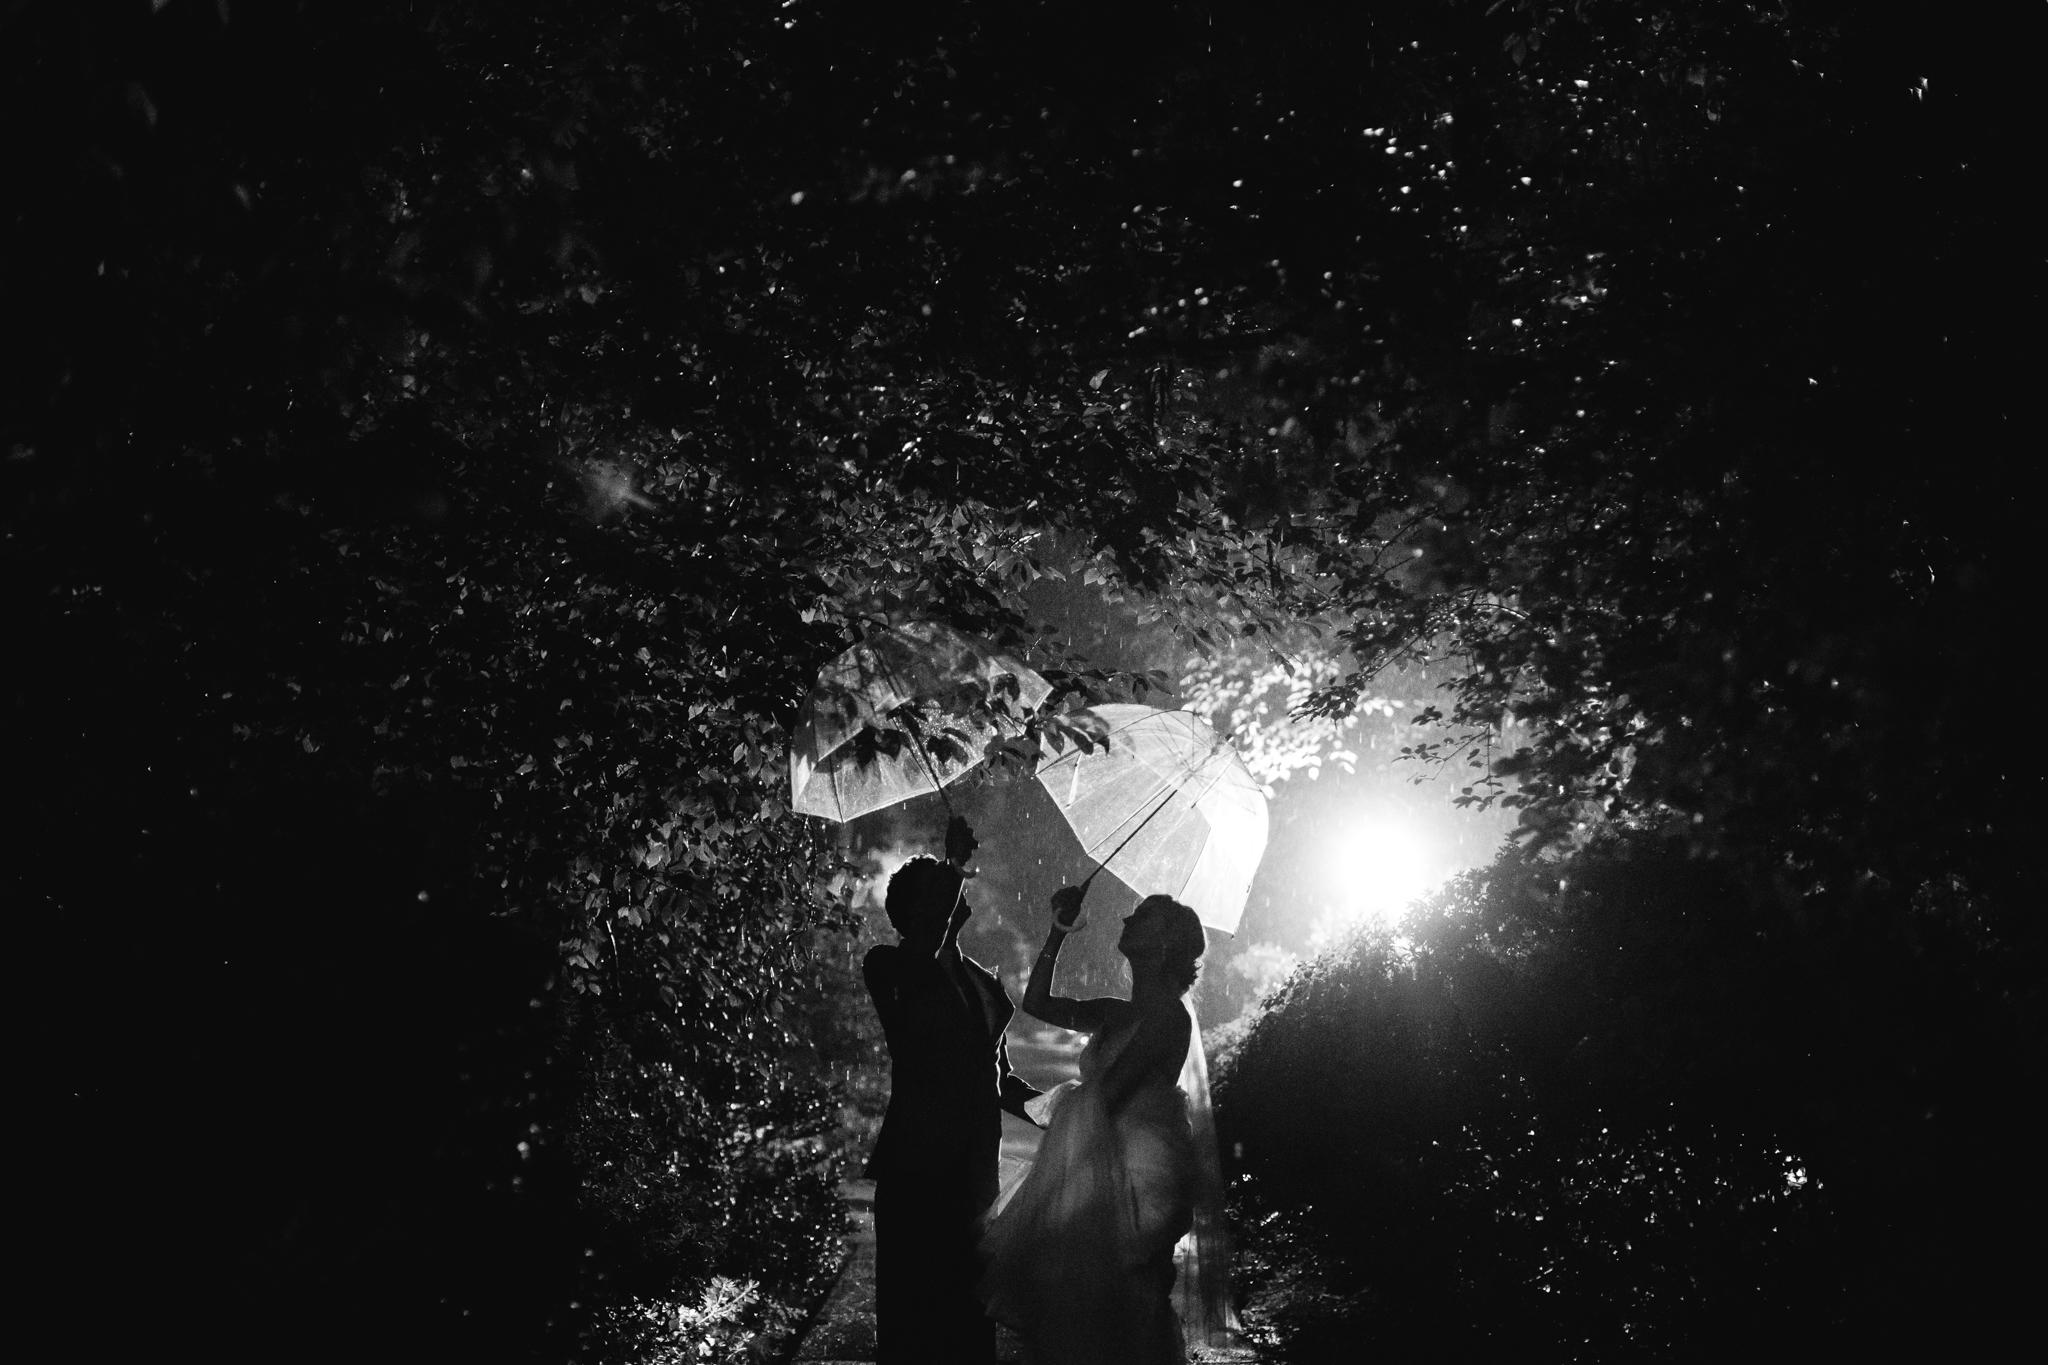 dixon-memphis-wedding-photographers-thewarmtharoundyou-adrianne-drew (25 of 43).jpg